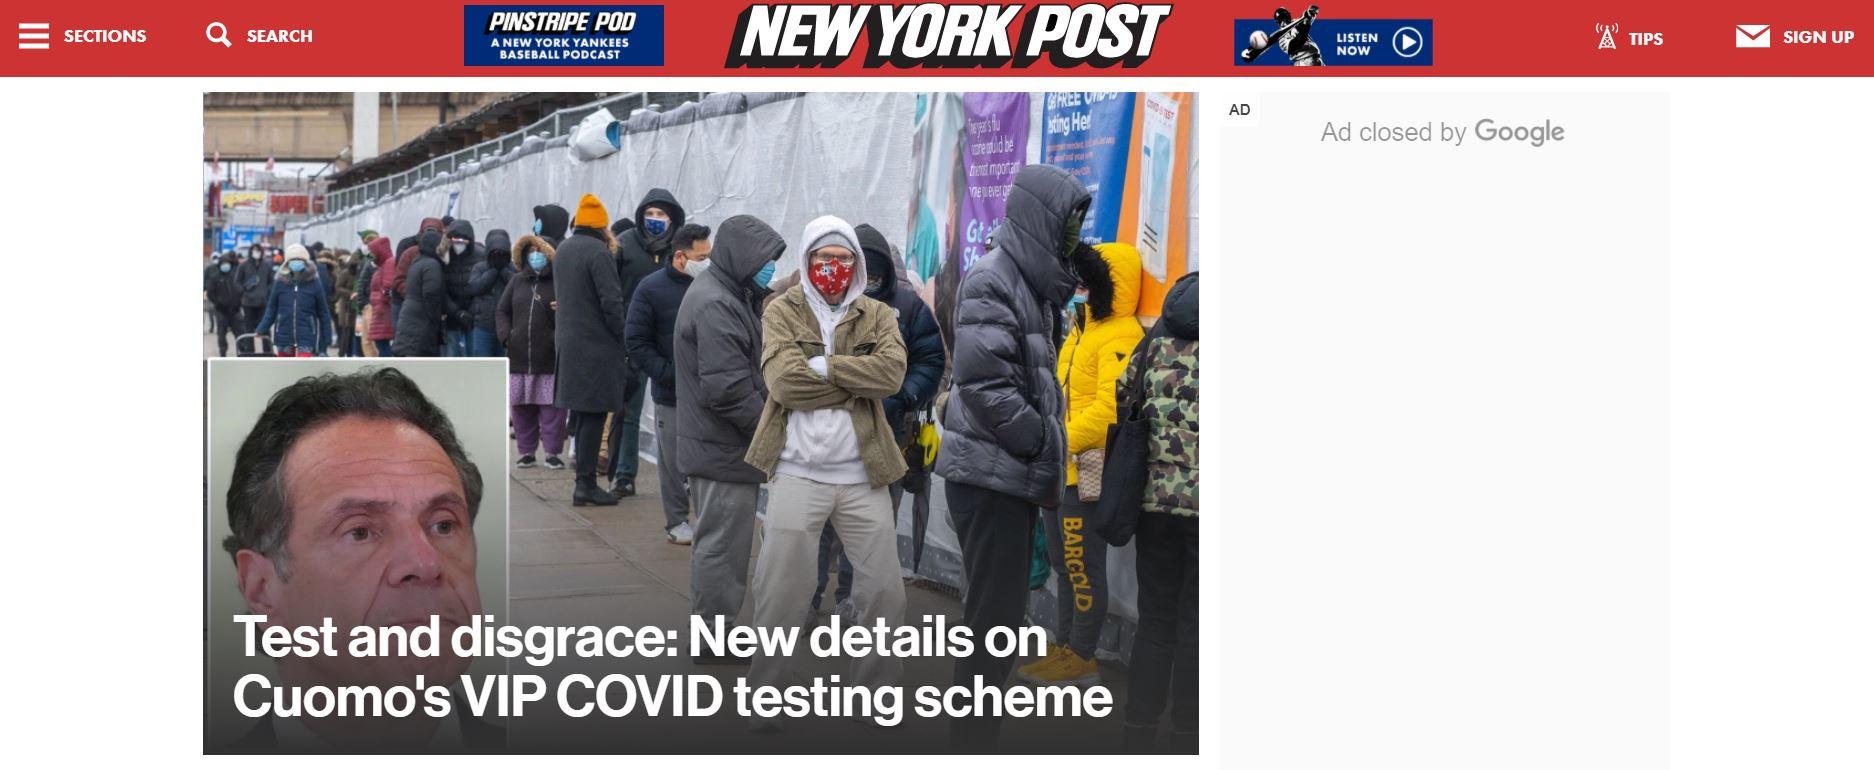 New York Post website